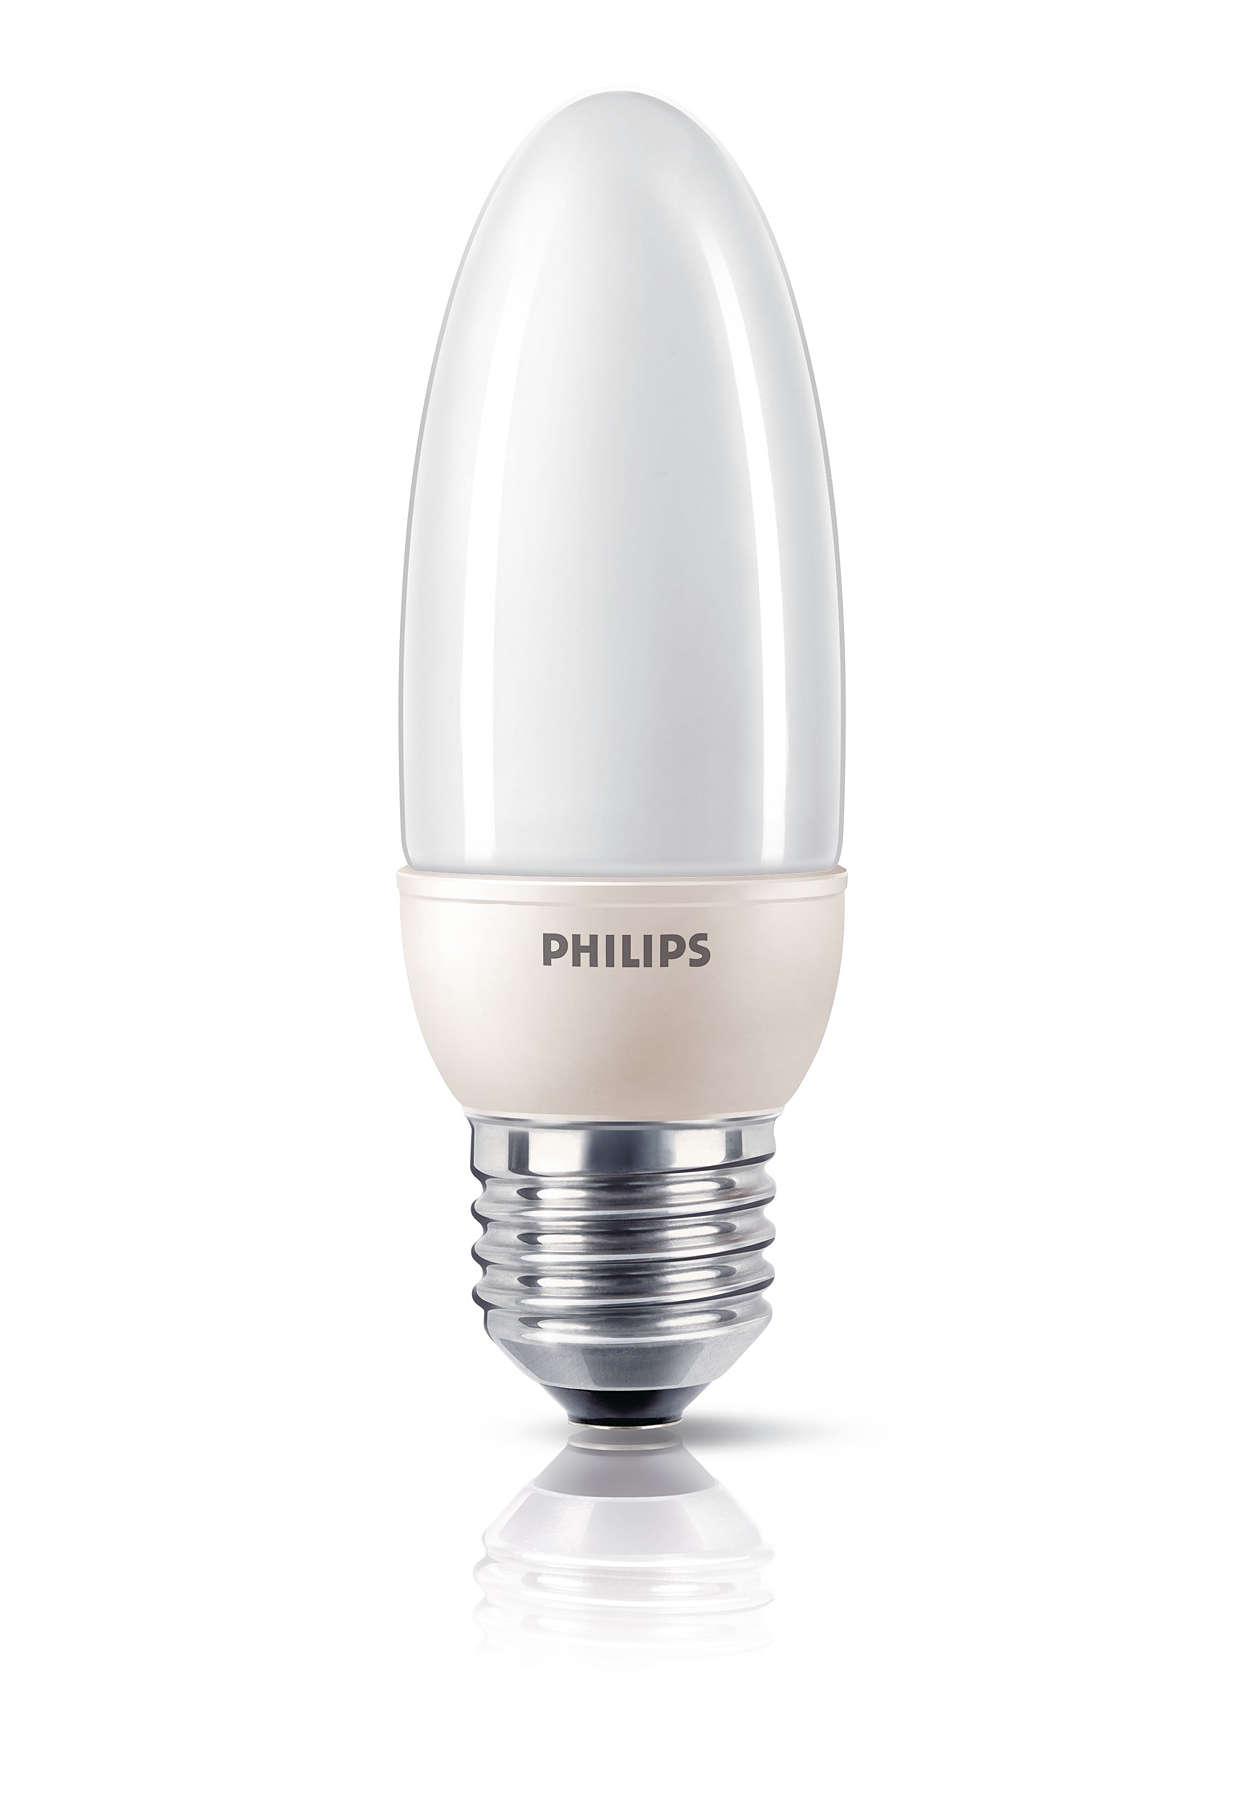 Poupança de energia num design tradicional